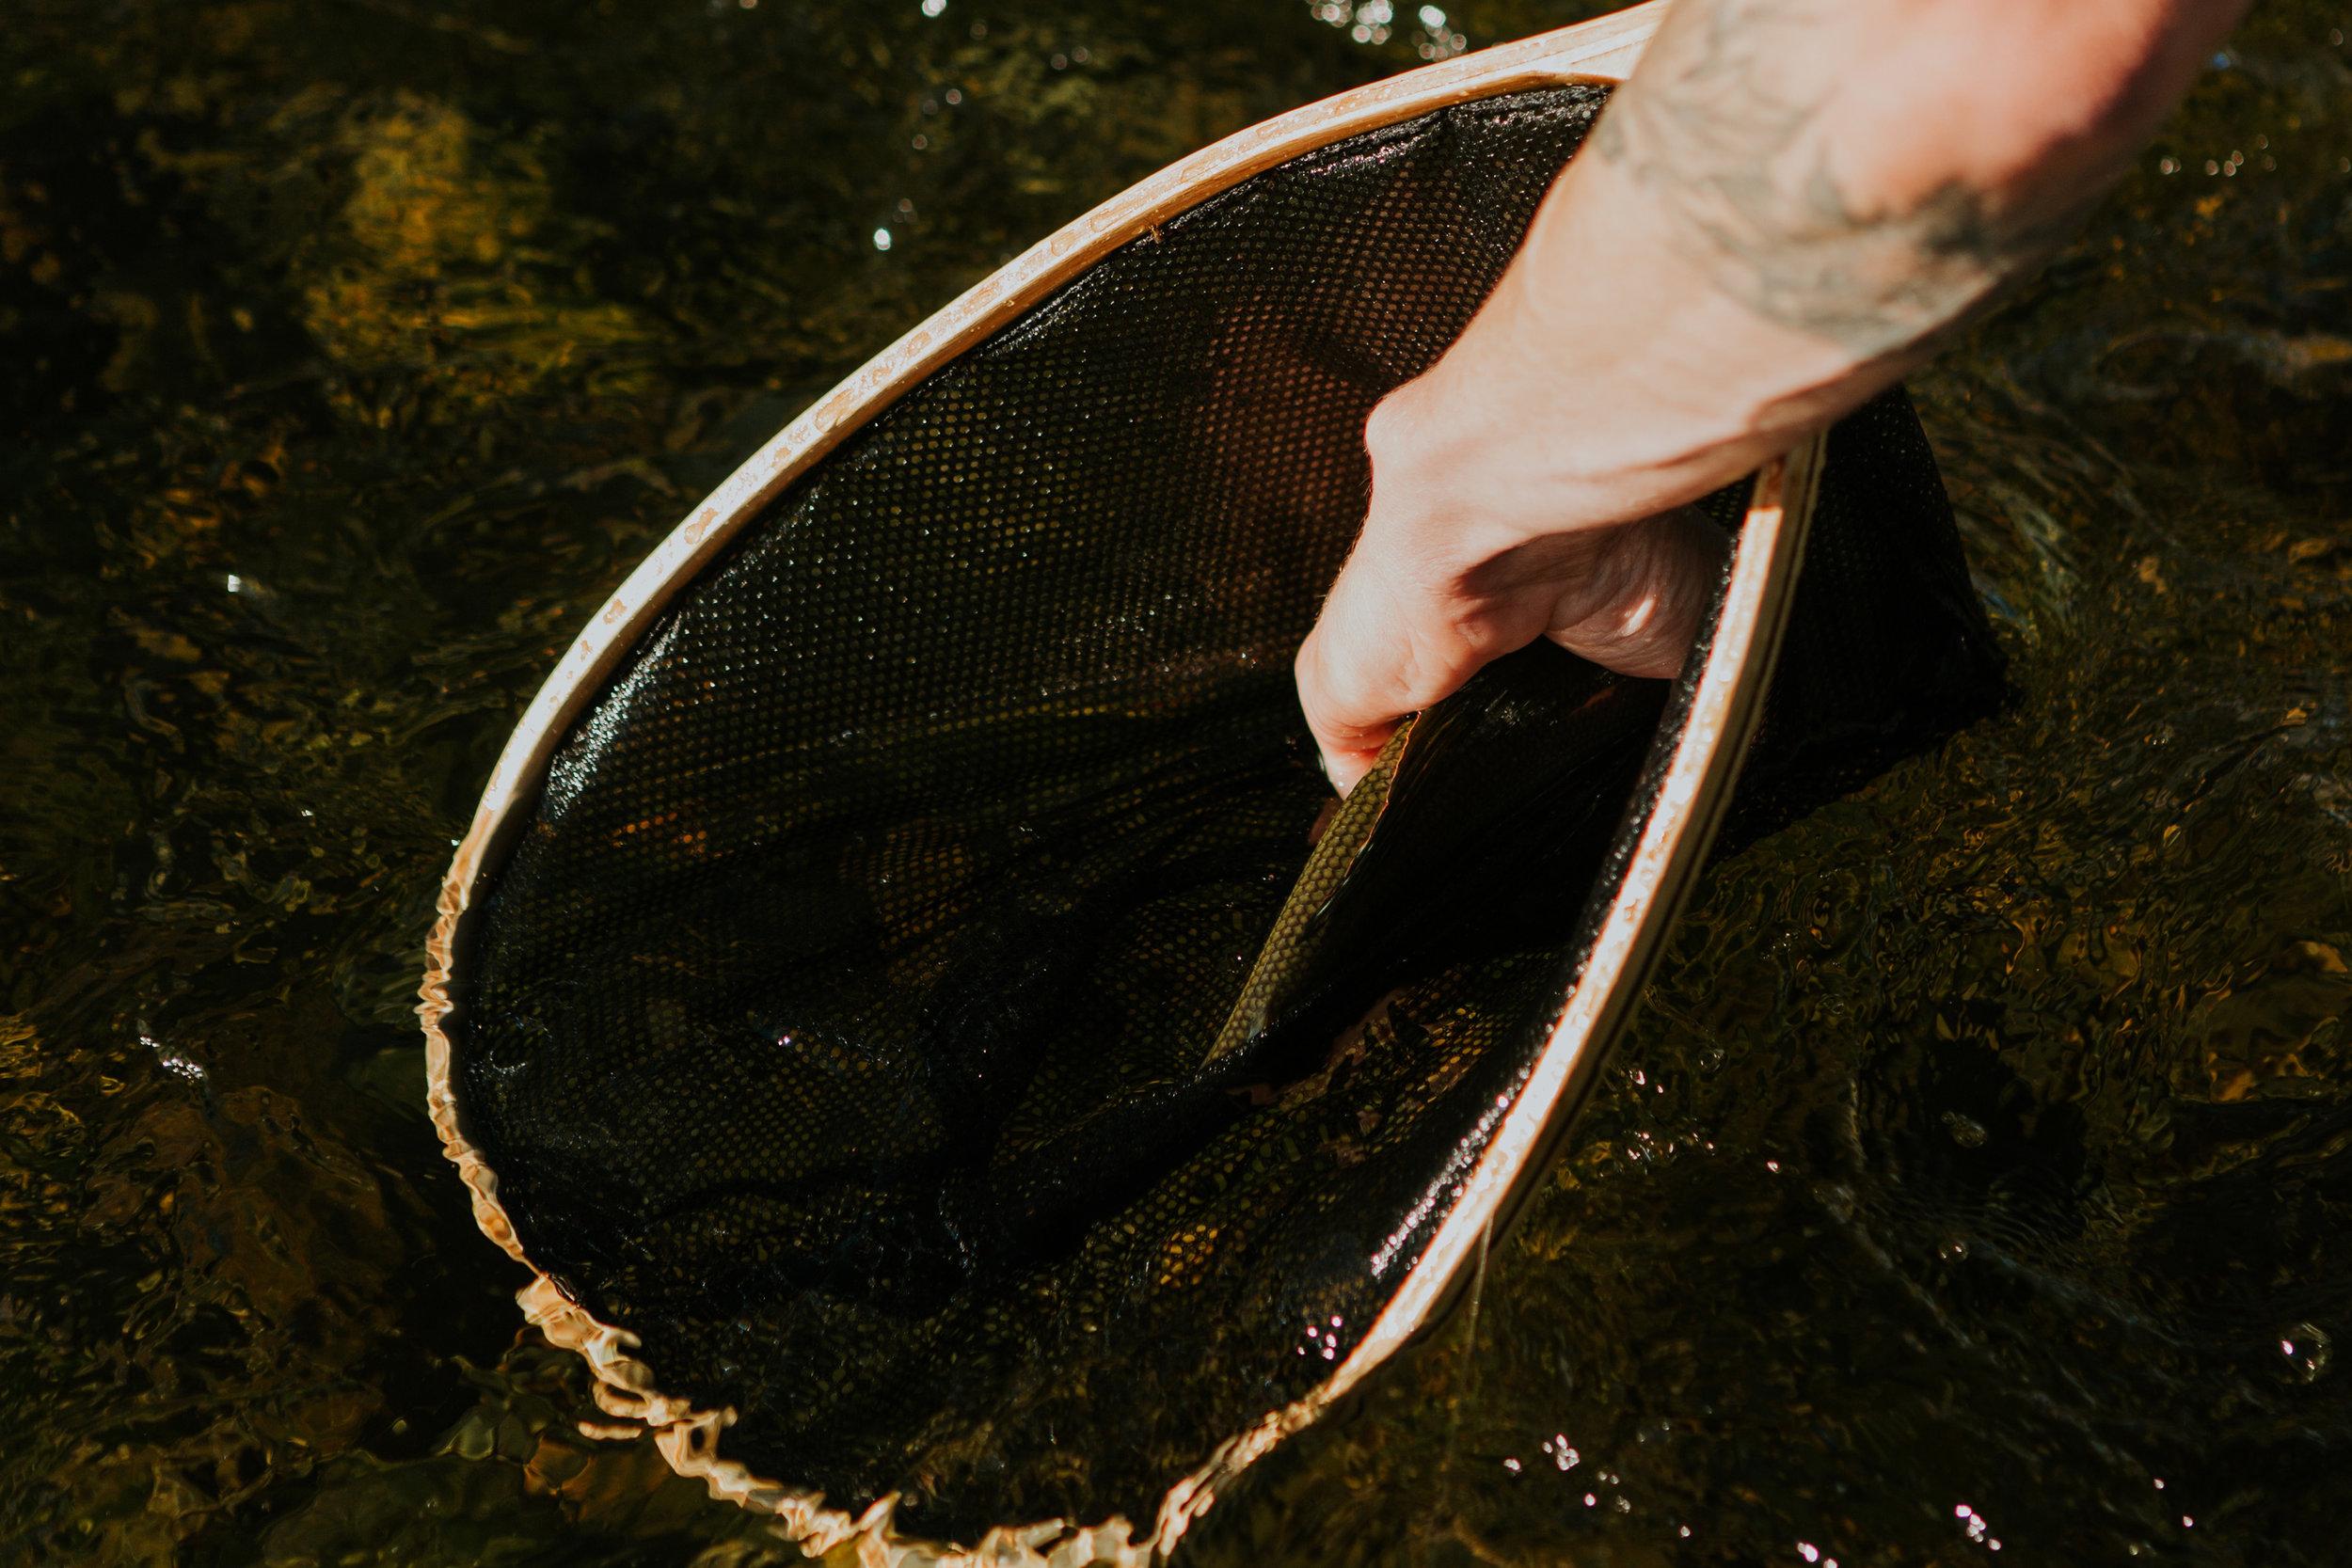 CindyGiovagnoli_Alaska_KoyukukRiver_SukakpakMountain_JimRiver_ArcticCircle_fly_fishing_September-064.jpg